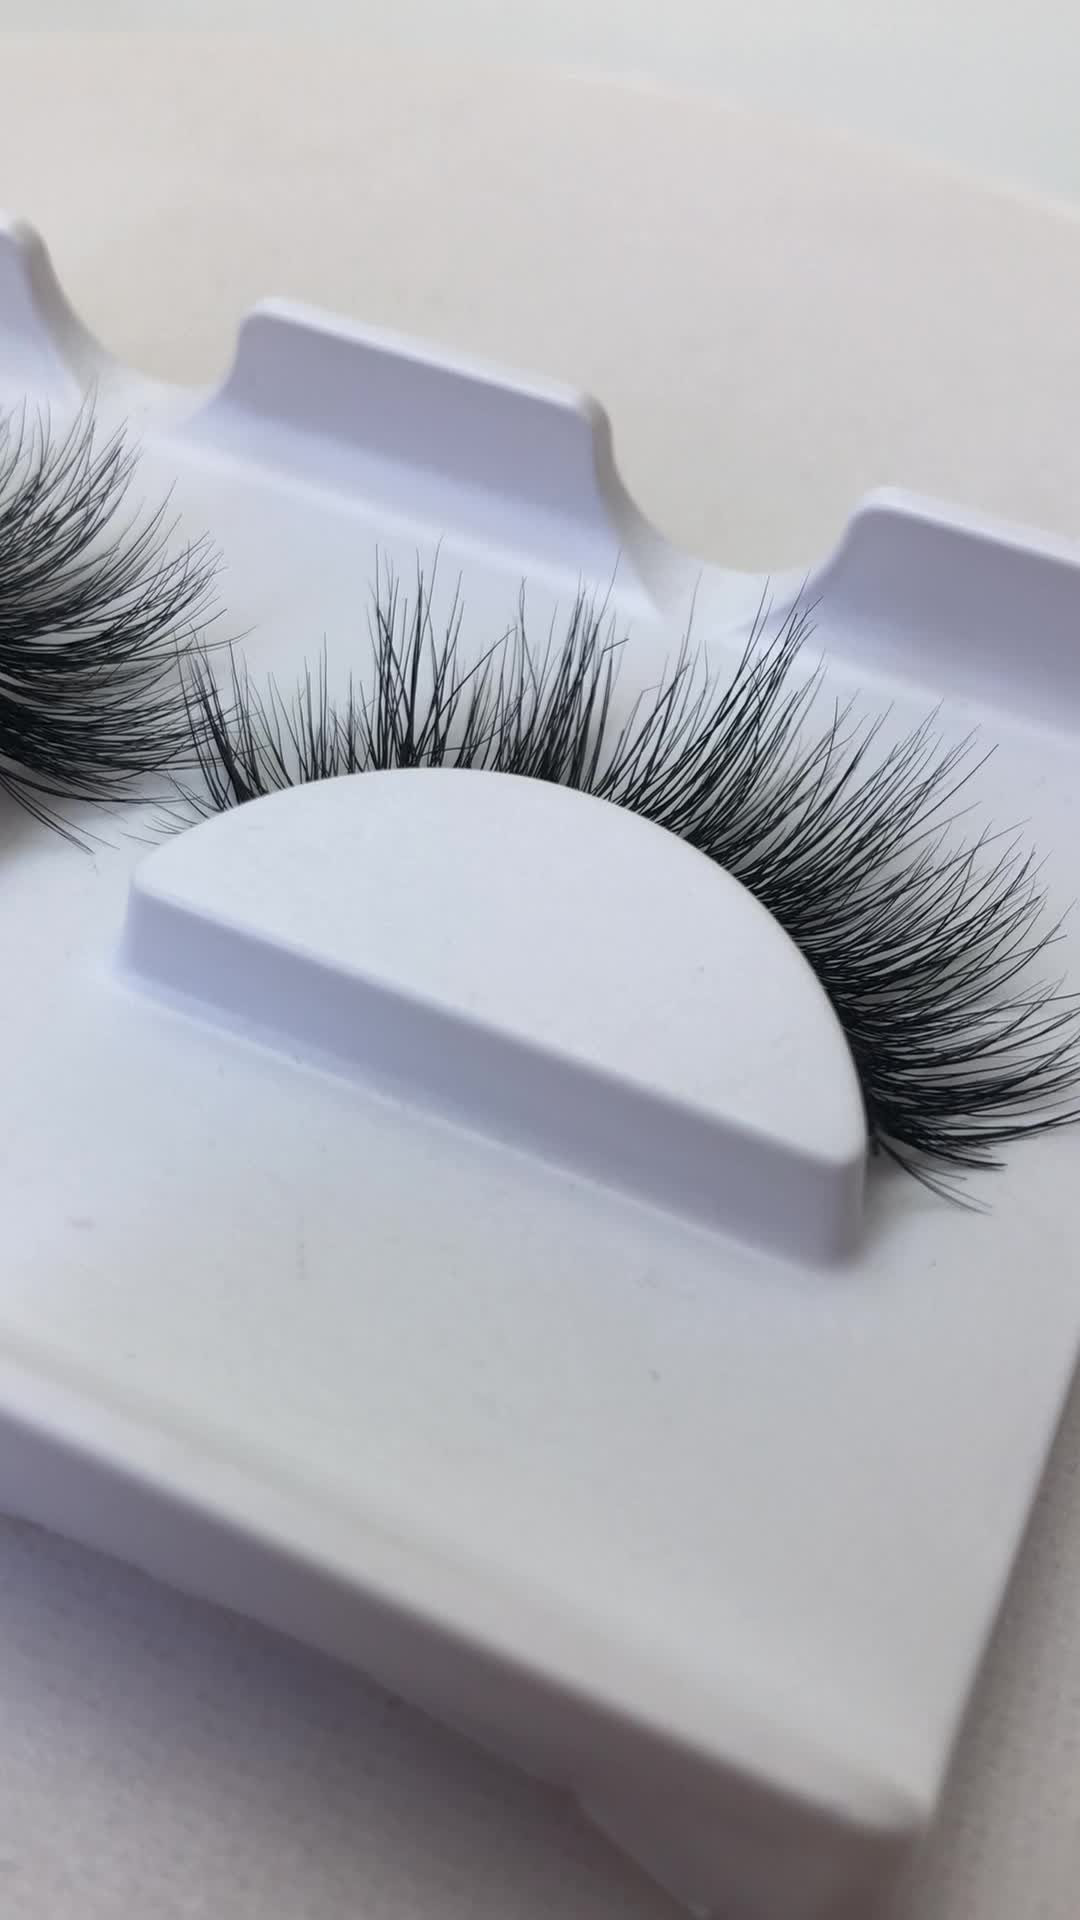 Wholesale 100% Real Siberian Mink Fur Mink Eyelashes 3d ...